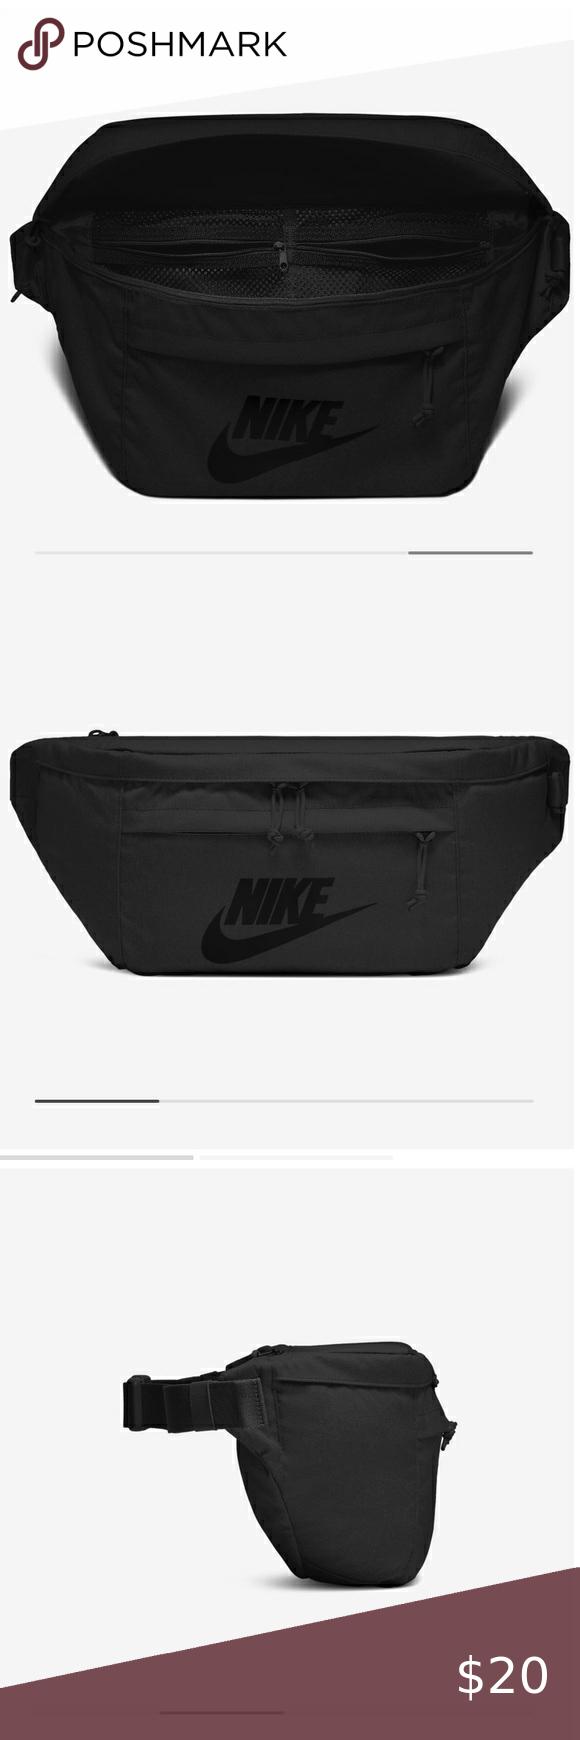 Unisex Nike Tech Hip Bag⚡️BRAND NEW in 2020 Hip bag